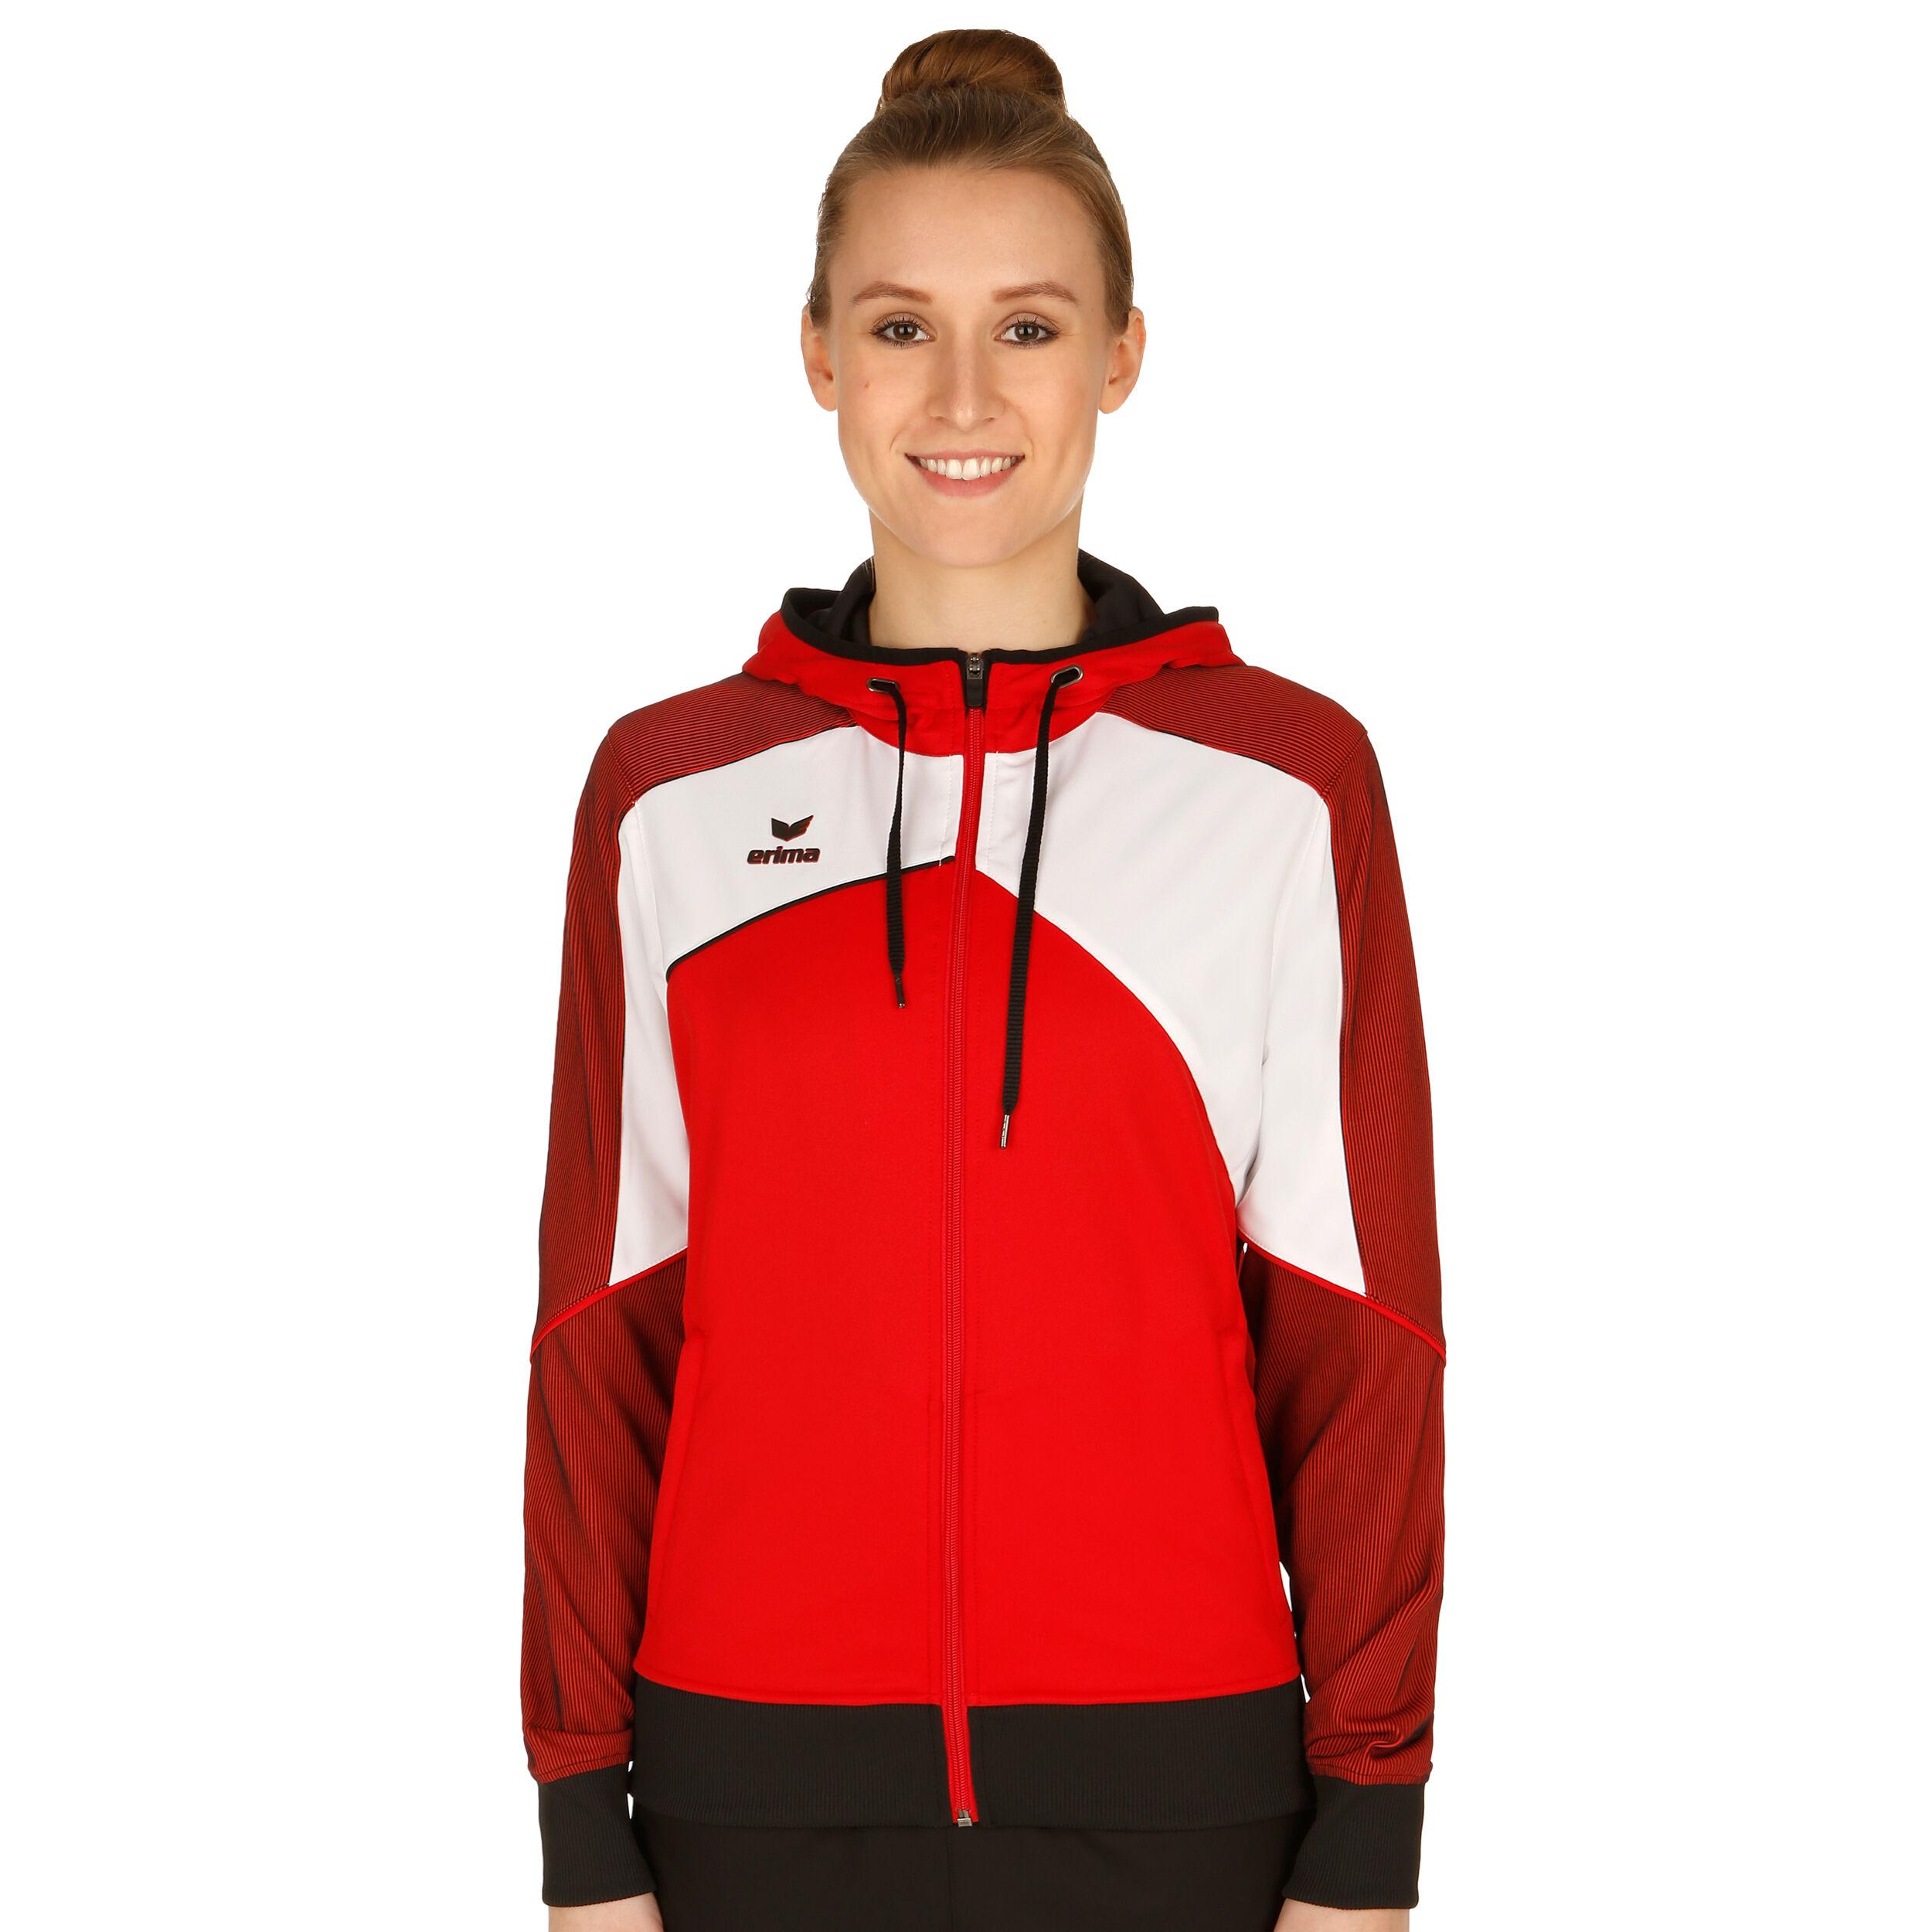 Erima Premium One 2.0 Trainingsjacke Damen Rot, Weiß